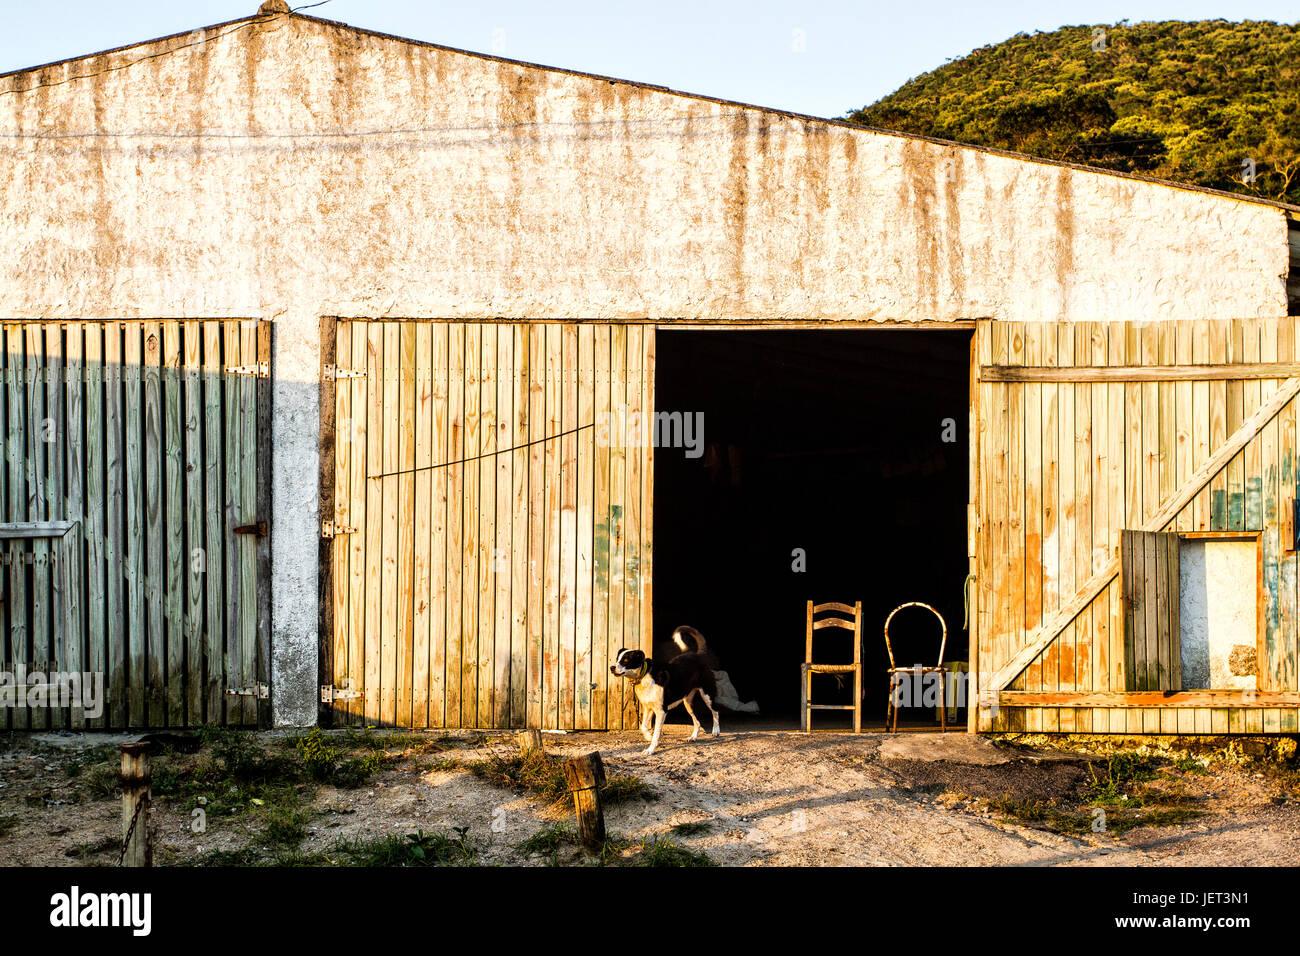 Dog in front of a shed at Pantano do Sul Beach. Florianopolis, Santa Catarina, Brazil. - Stock Image